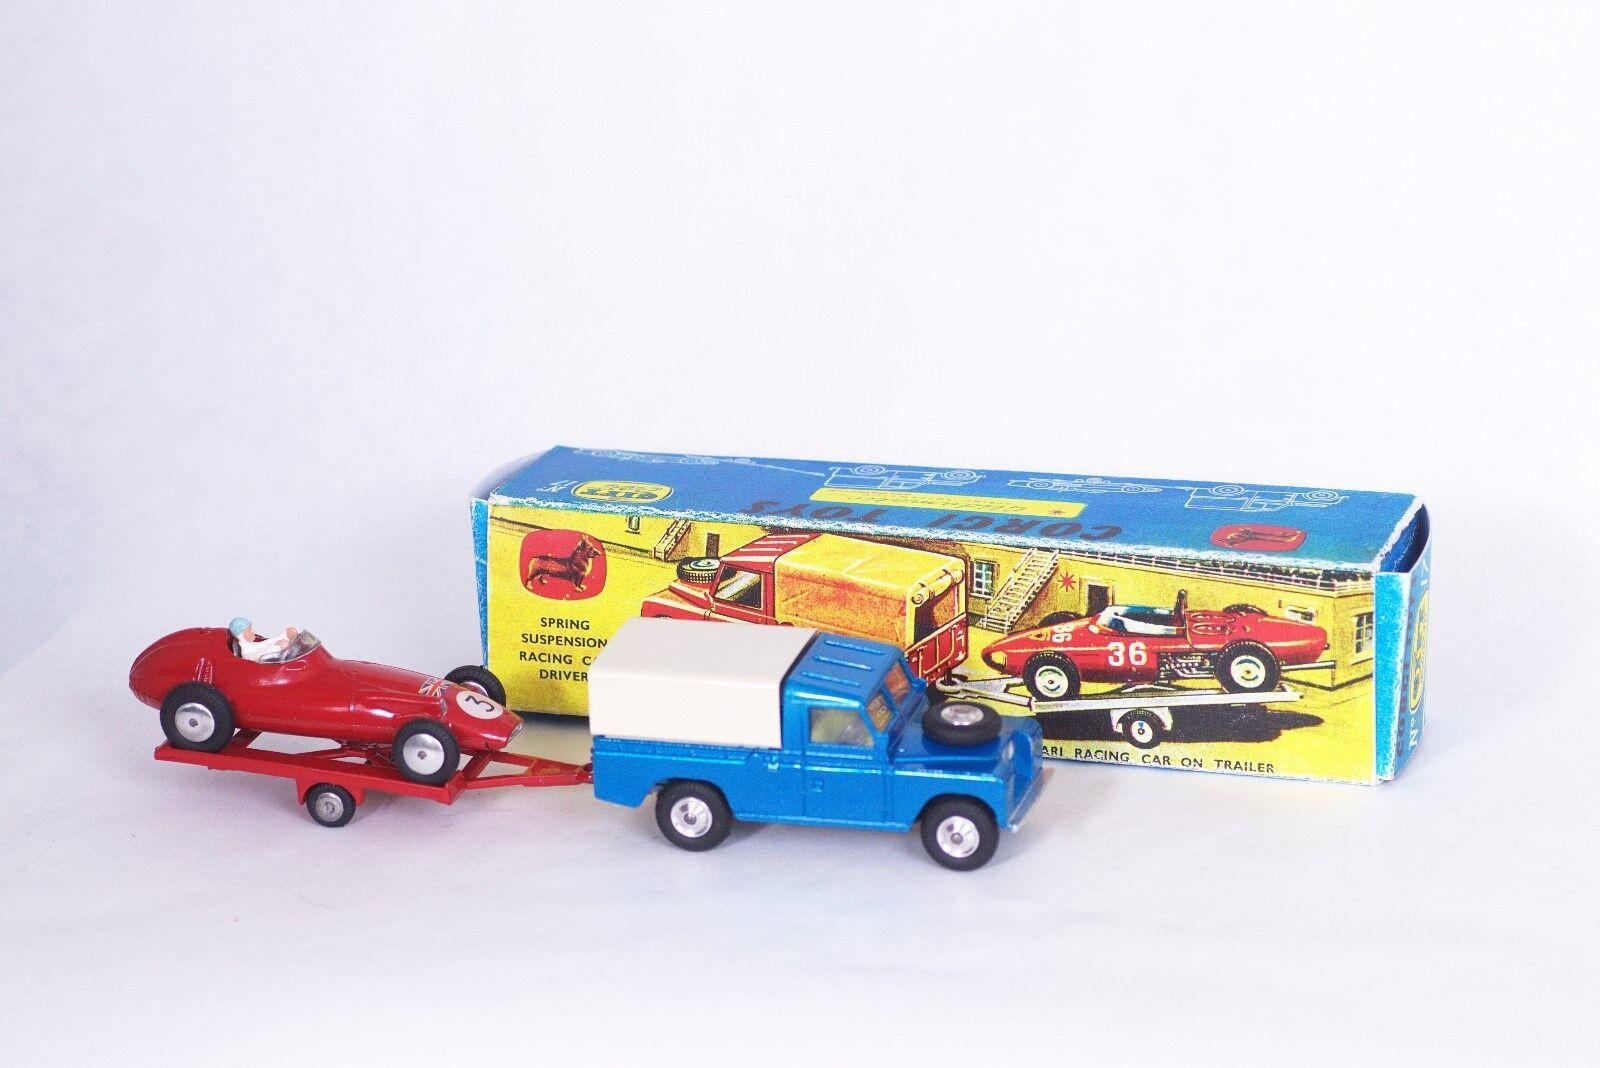 CORGI toys  Land rover & B.R.M FORMULE 1  poison set  code 3